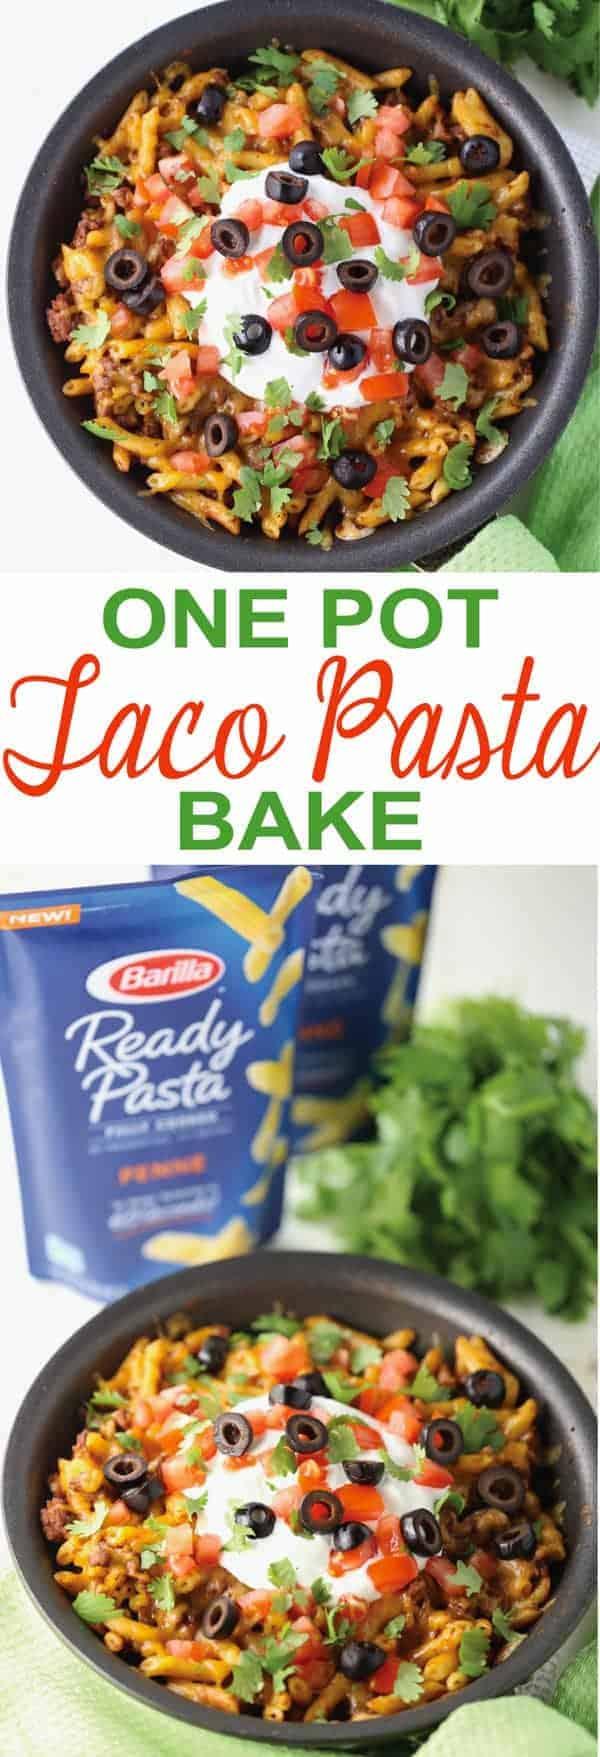 One Pot Taco Pasta Bake